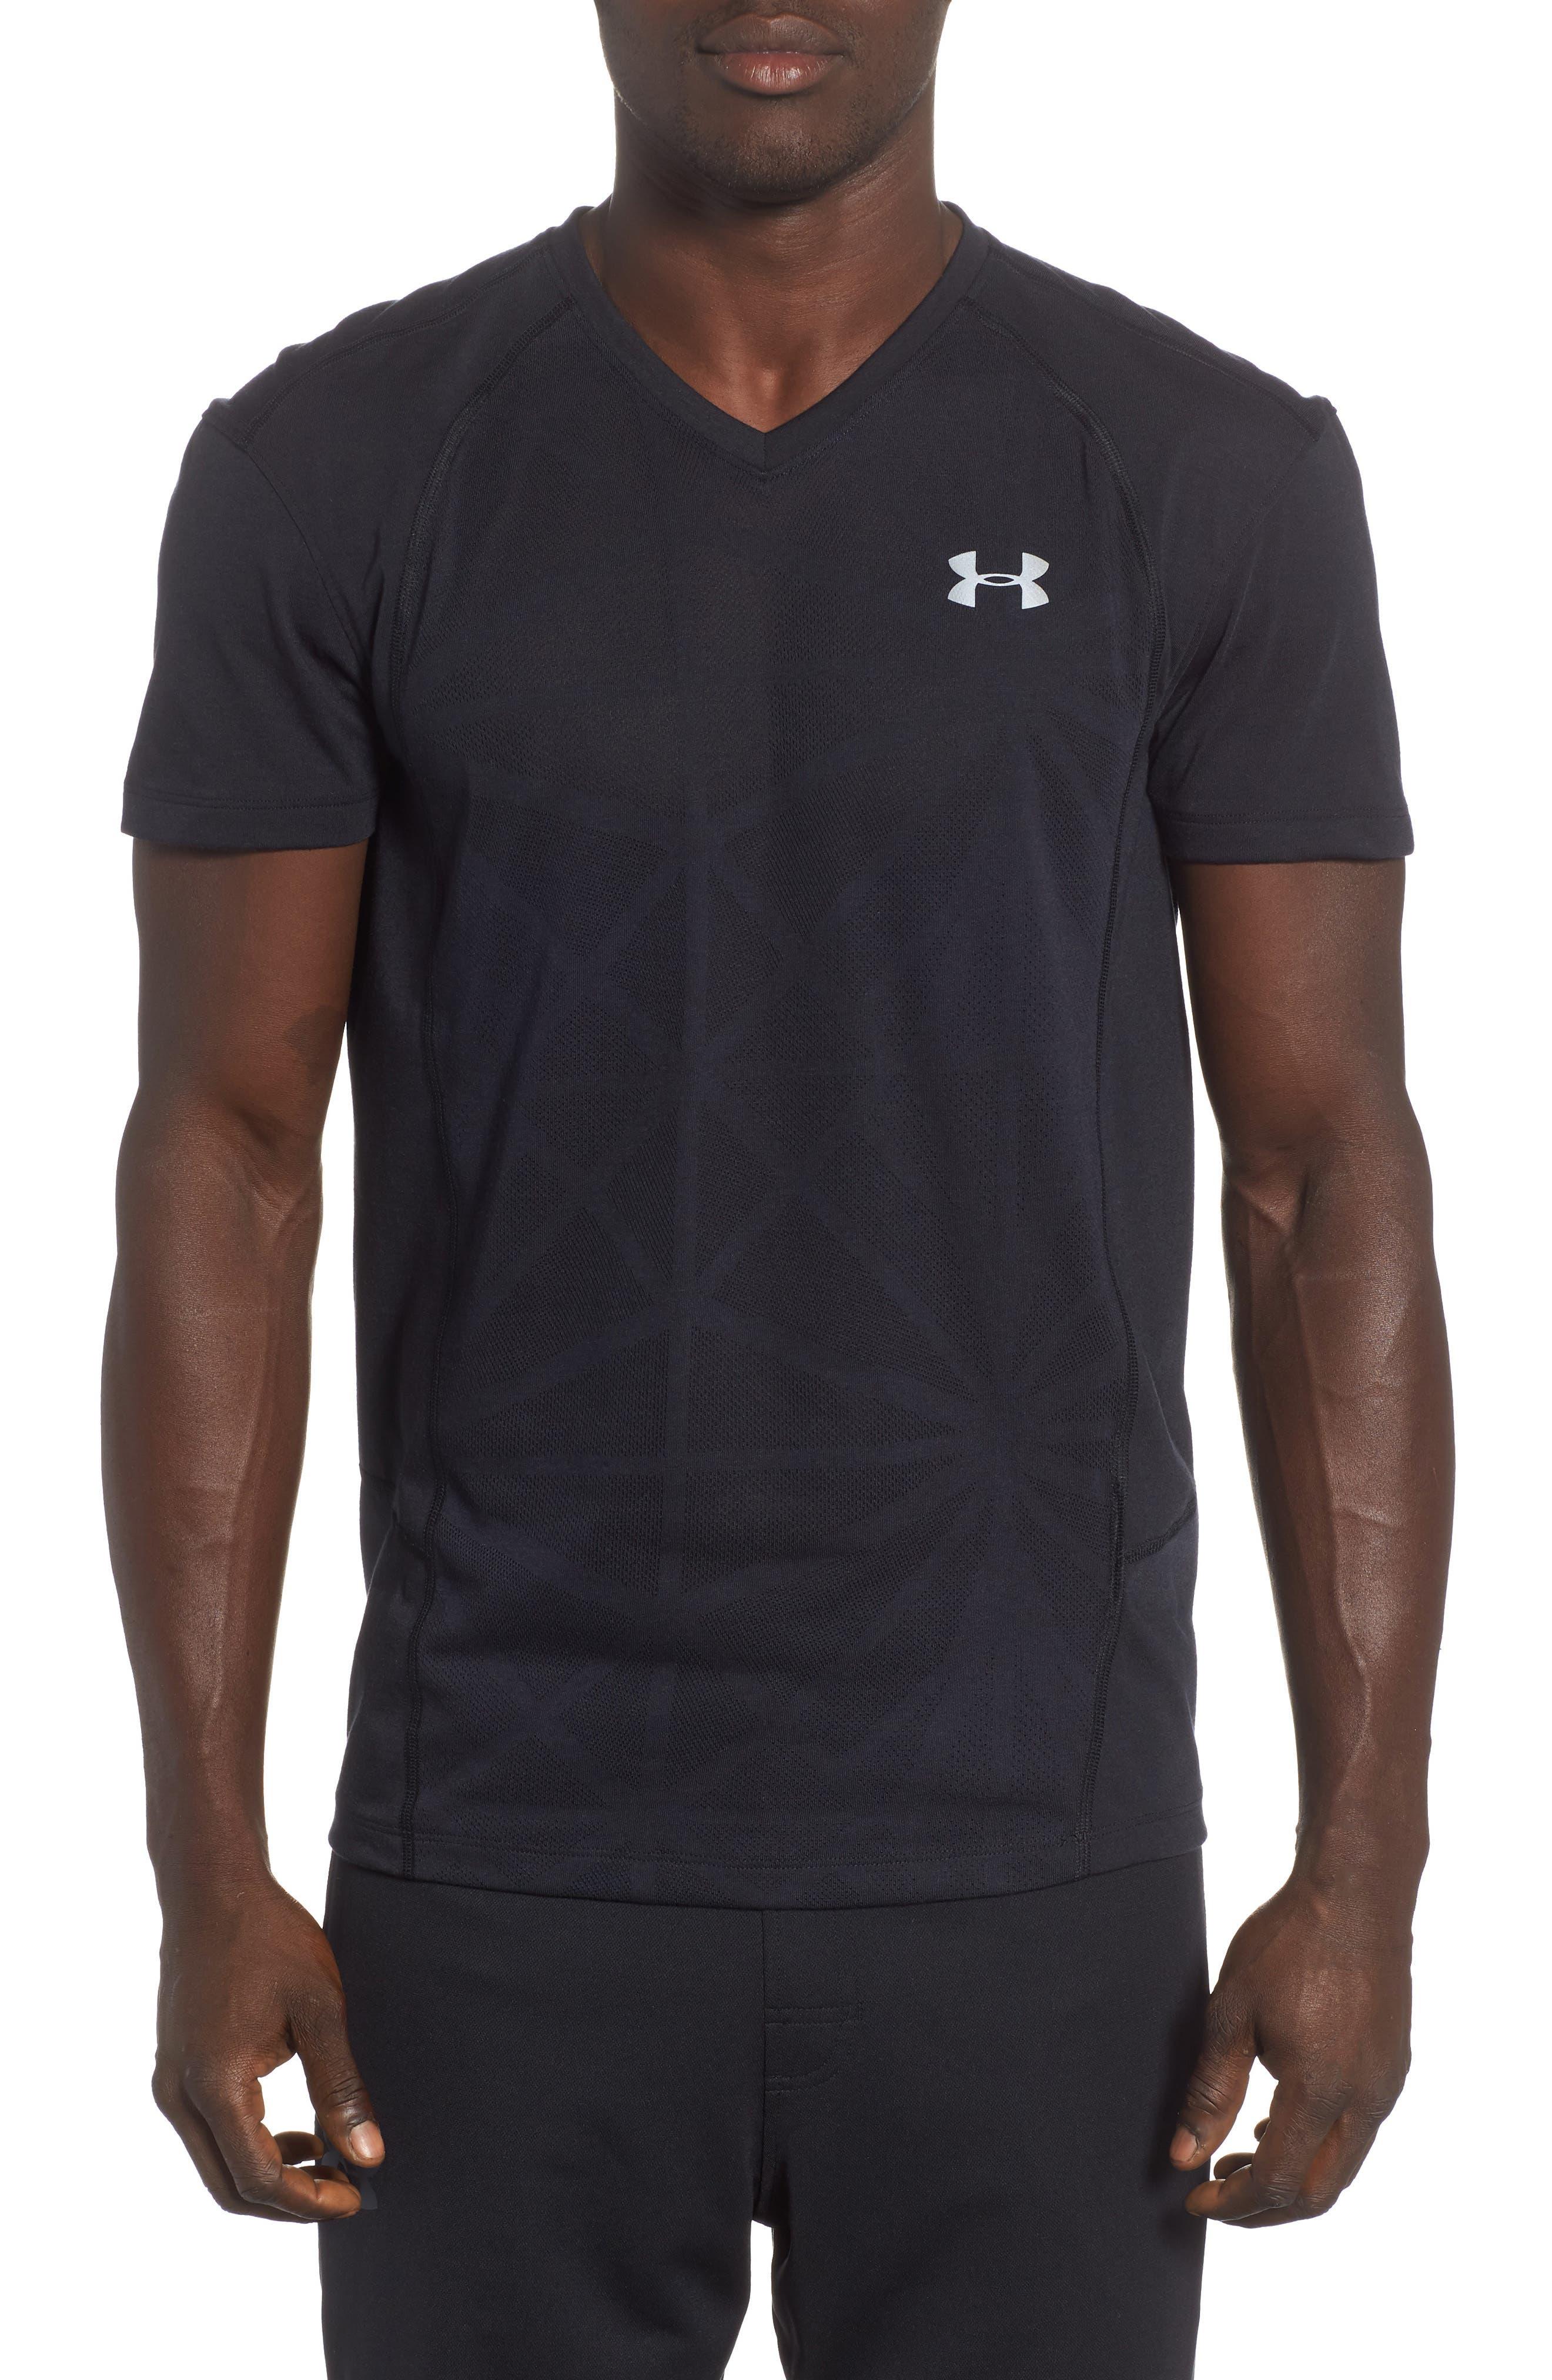 Microthread Swyft V-Neck T-Shirt,                             Main thumbnail 1, color,                             BLACK/ BLACK/ REFLECTIVE